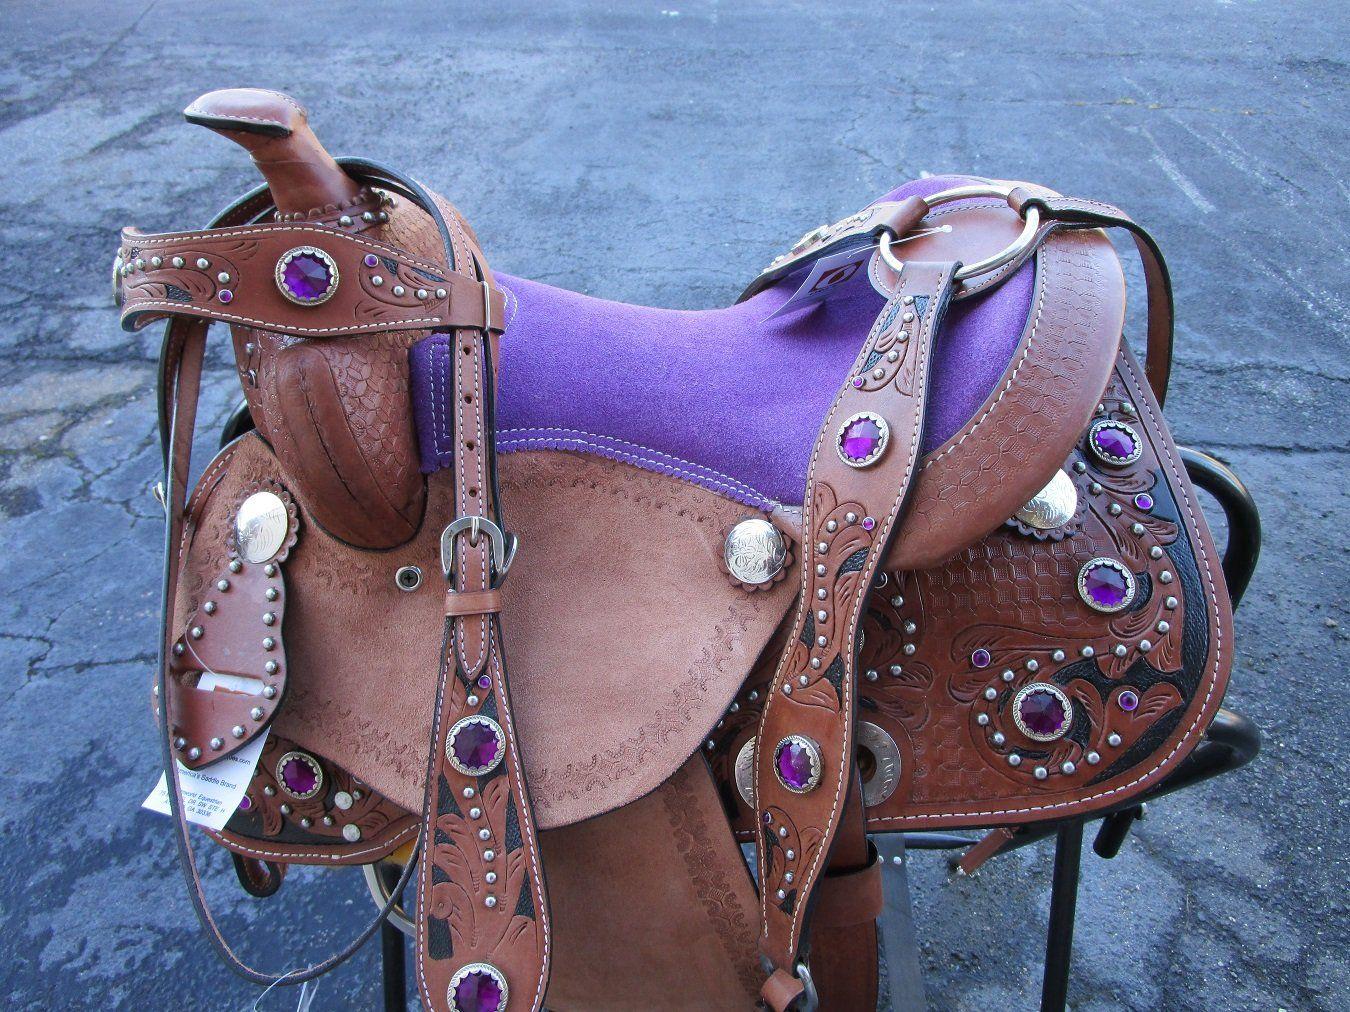 Saddle Western Barrel Pleasure Trail Cowboy Cowgirl Tooled Floral Basket Brown Black Kids Saddle Western Saddles For Sale Barrel Saddles For Sale